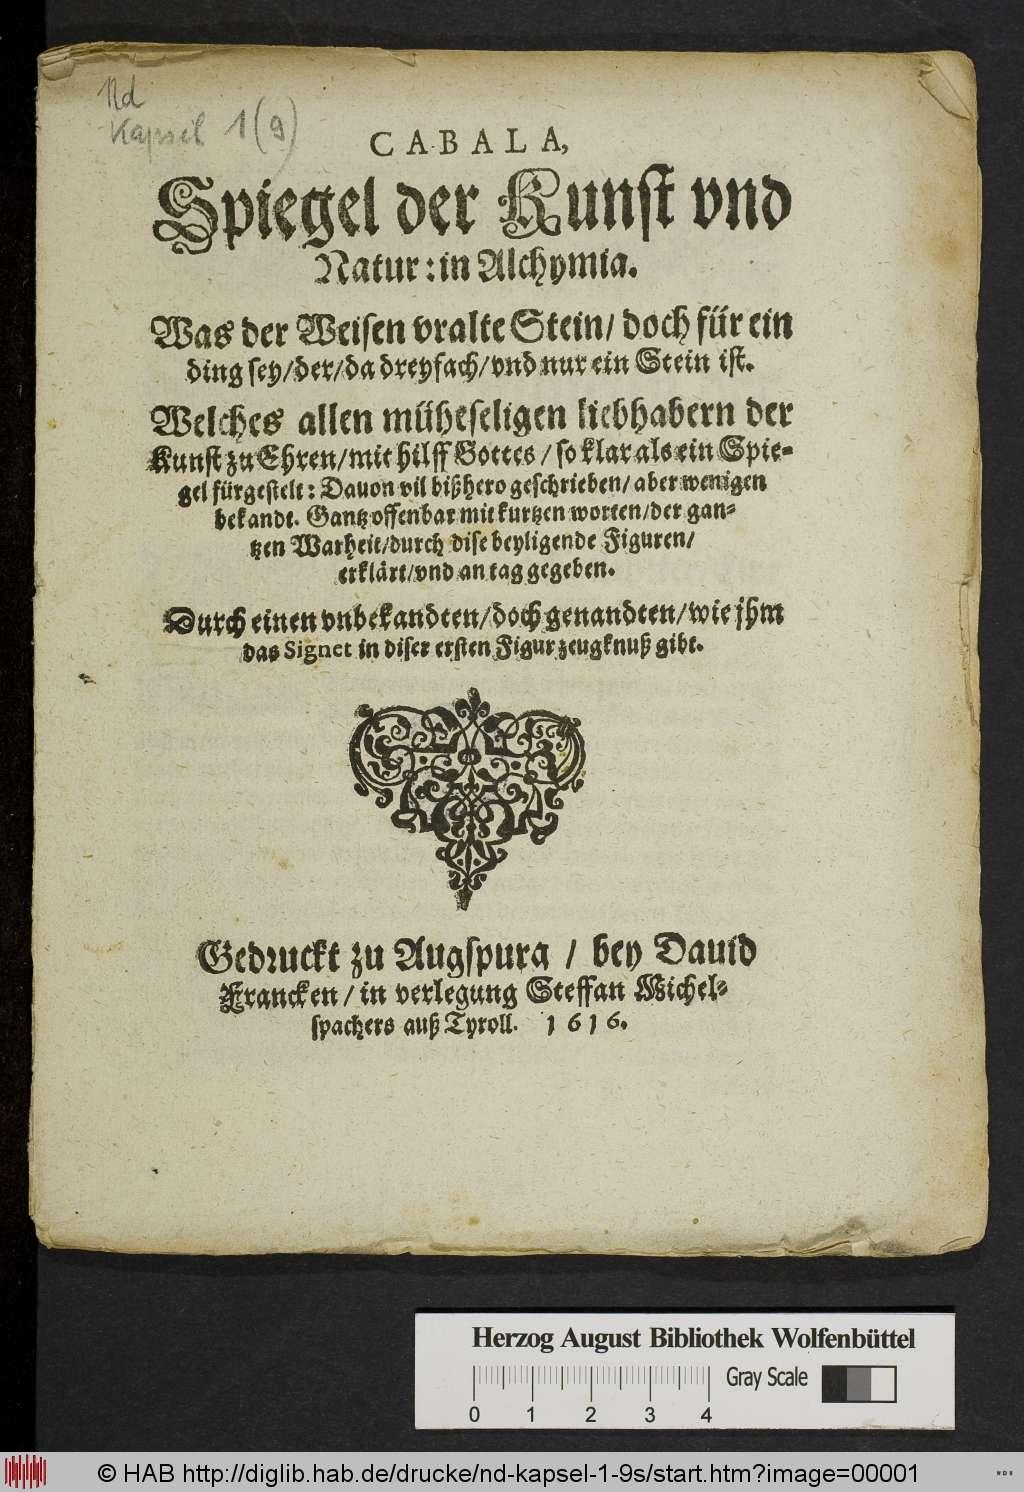 http://diglib.hab.de/drucke/nd-kapsel-1-9s/00001.jpg